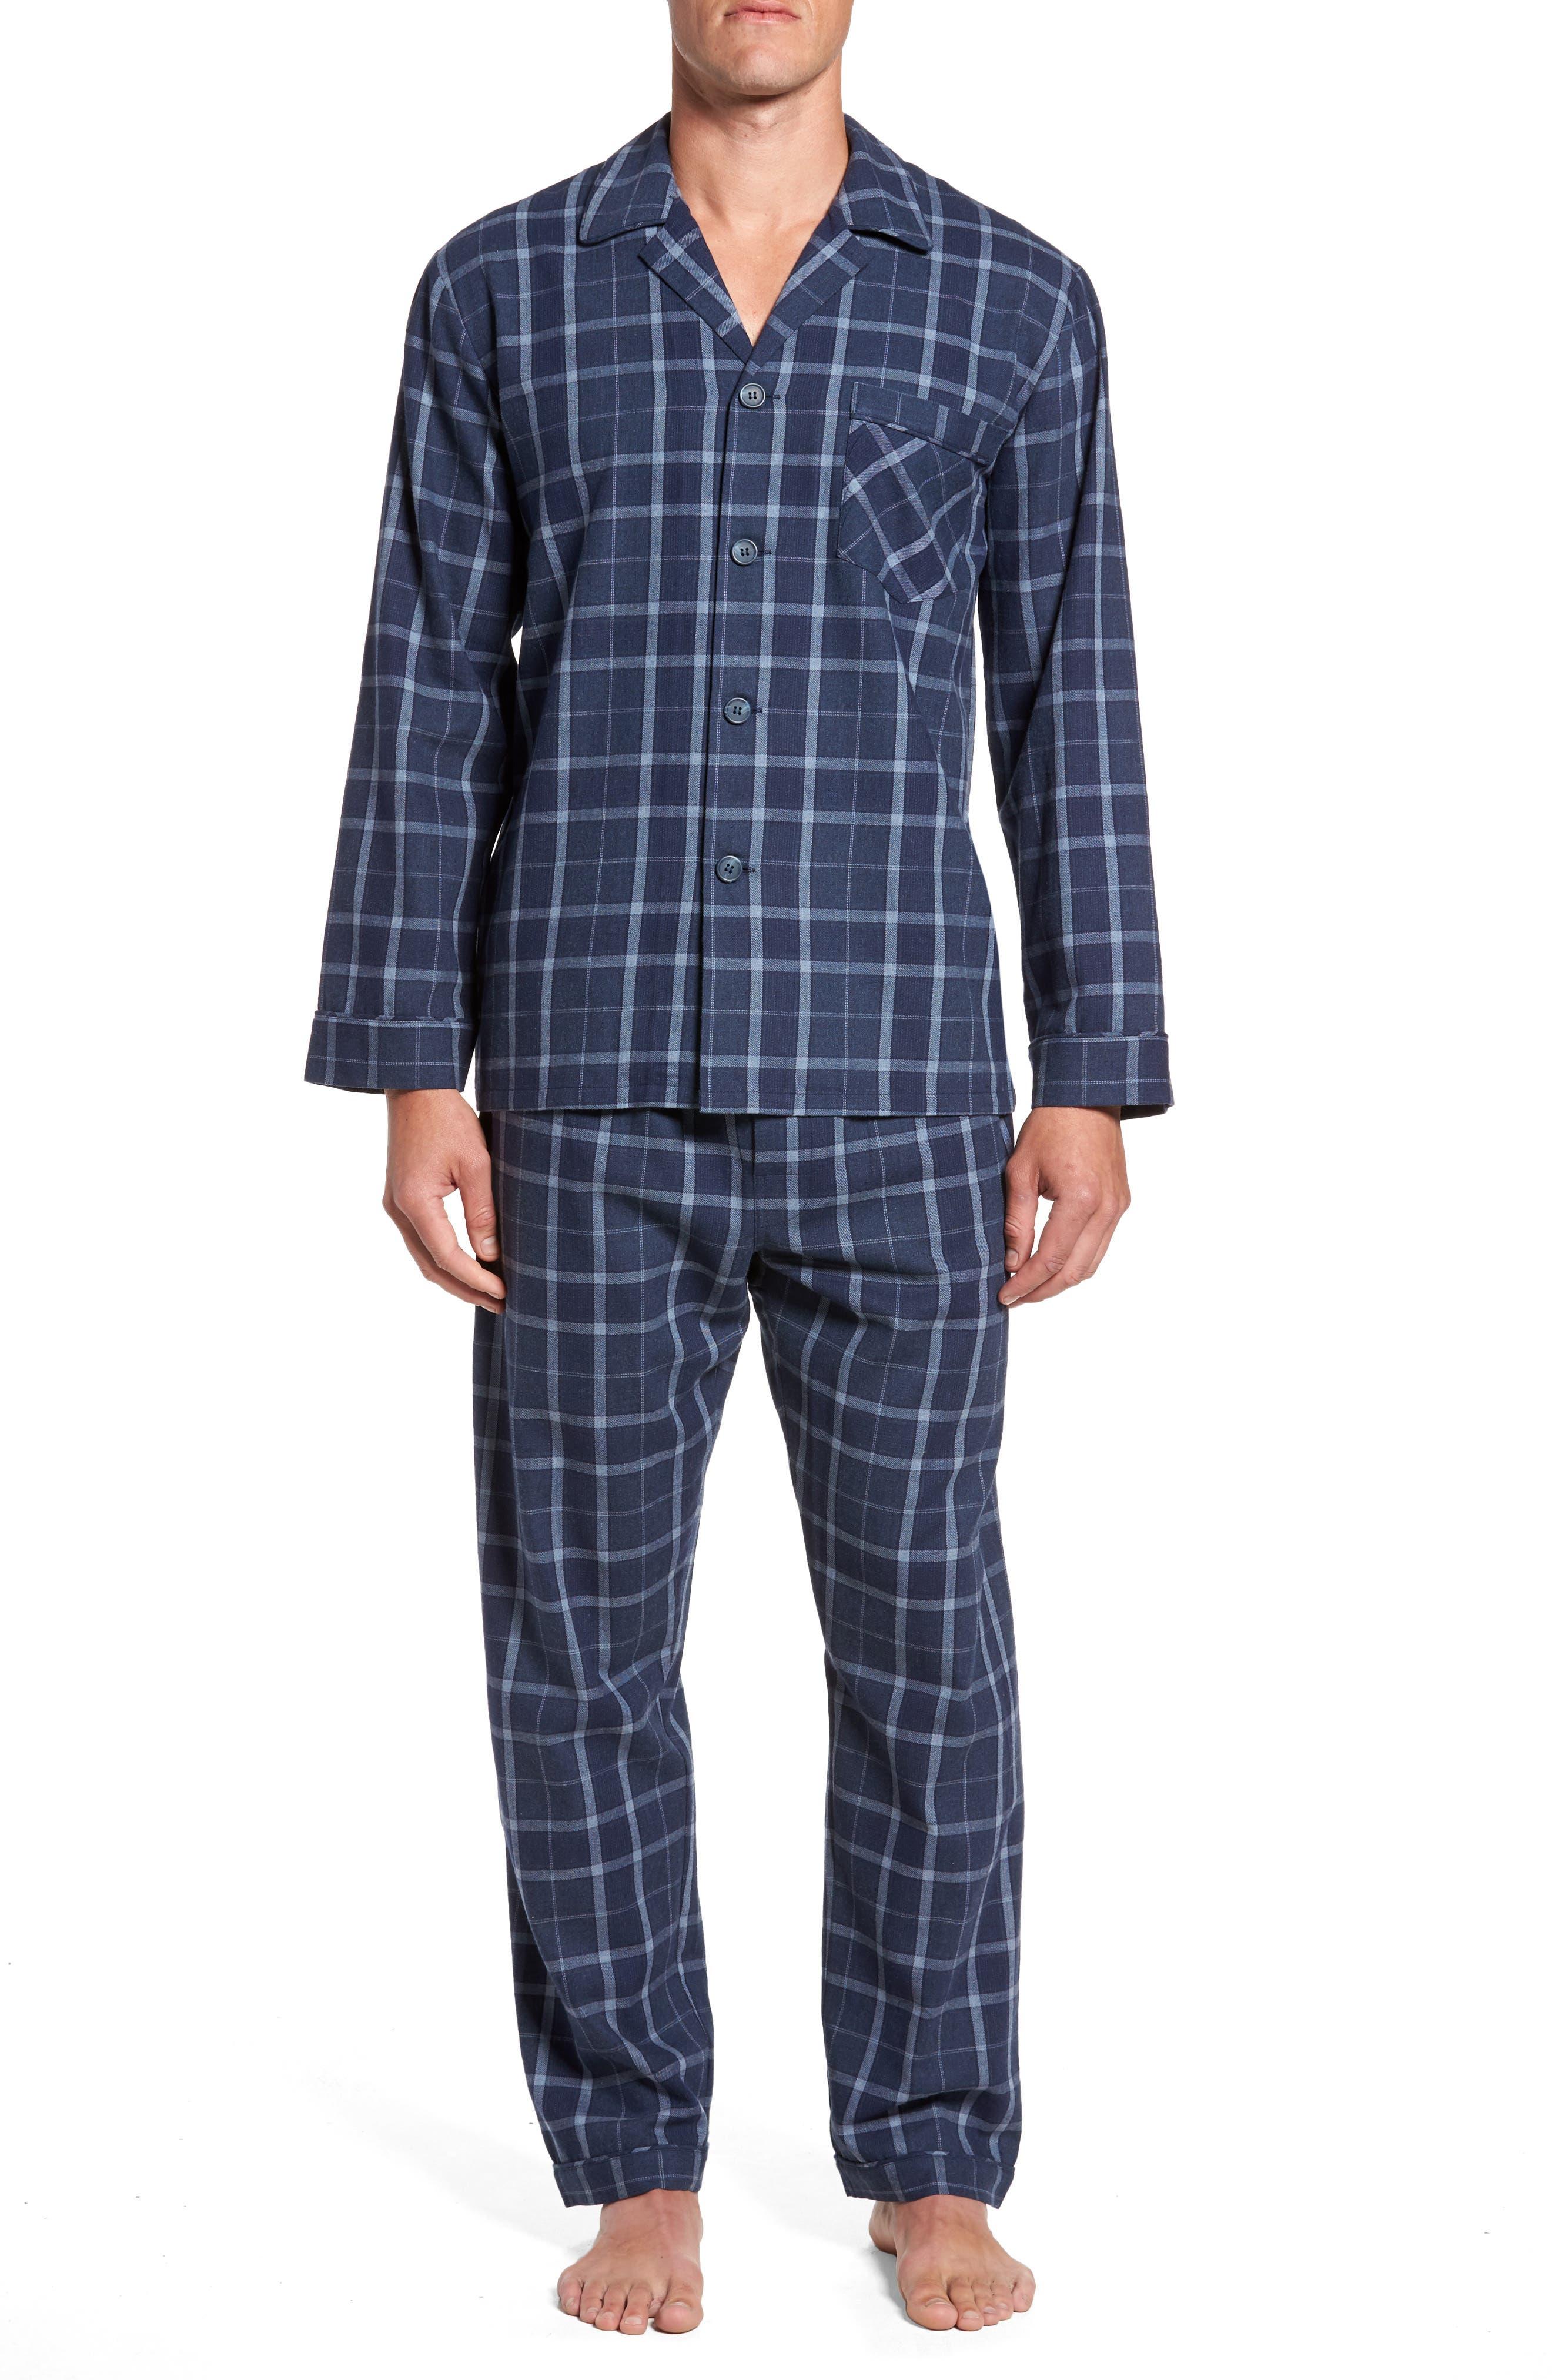 Guiness Plaid Pajama Set,                             Main thumbnail 1, color,                             Navy